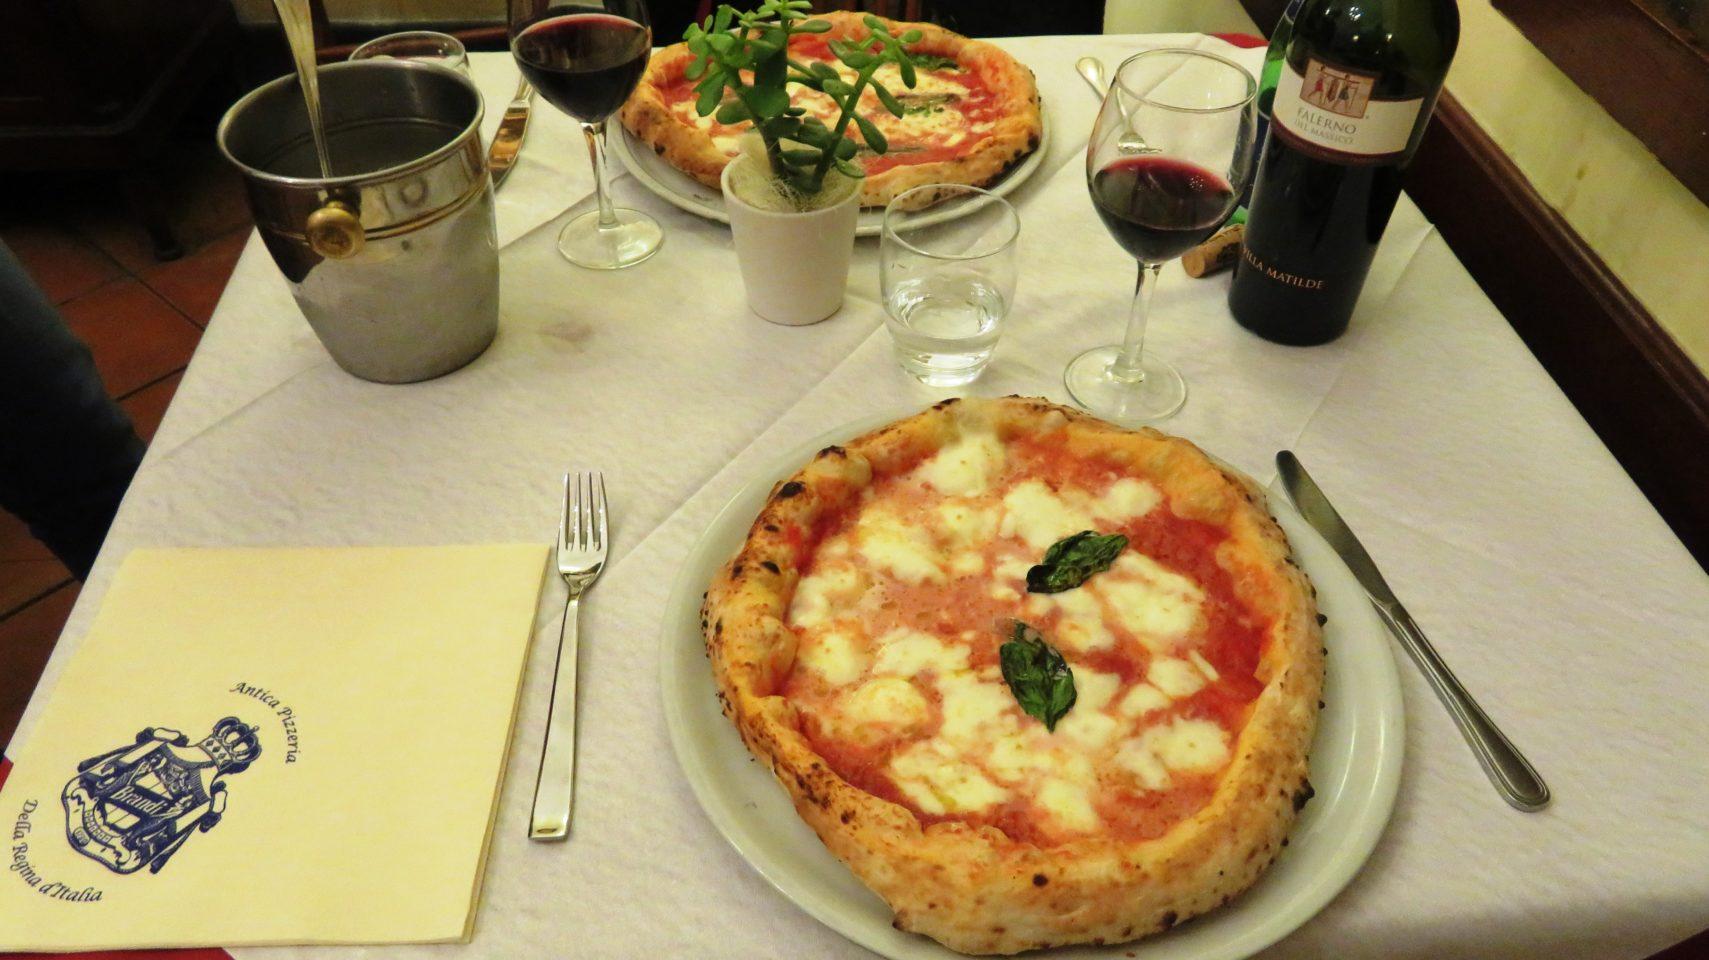 Pizza Margherita at Pizzeria Brandi in Naples Italy